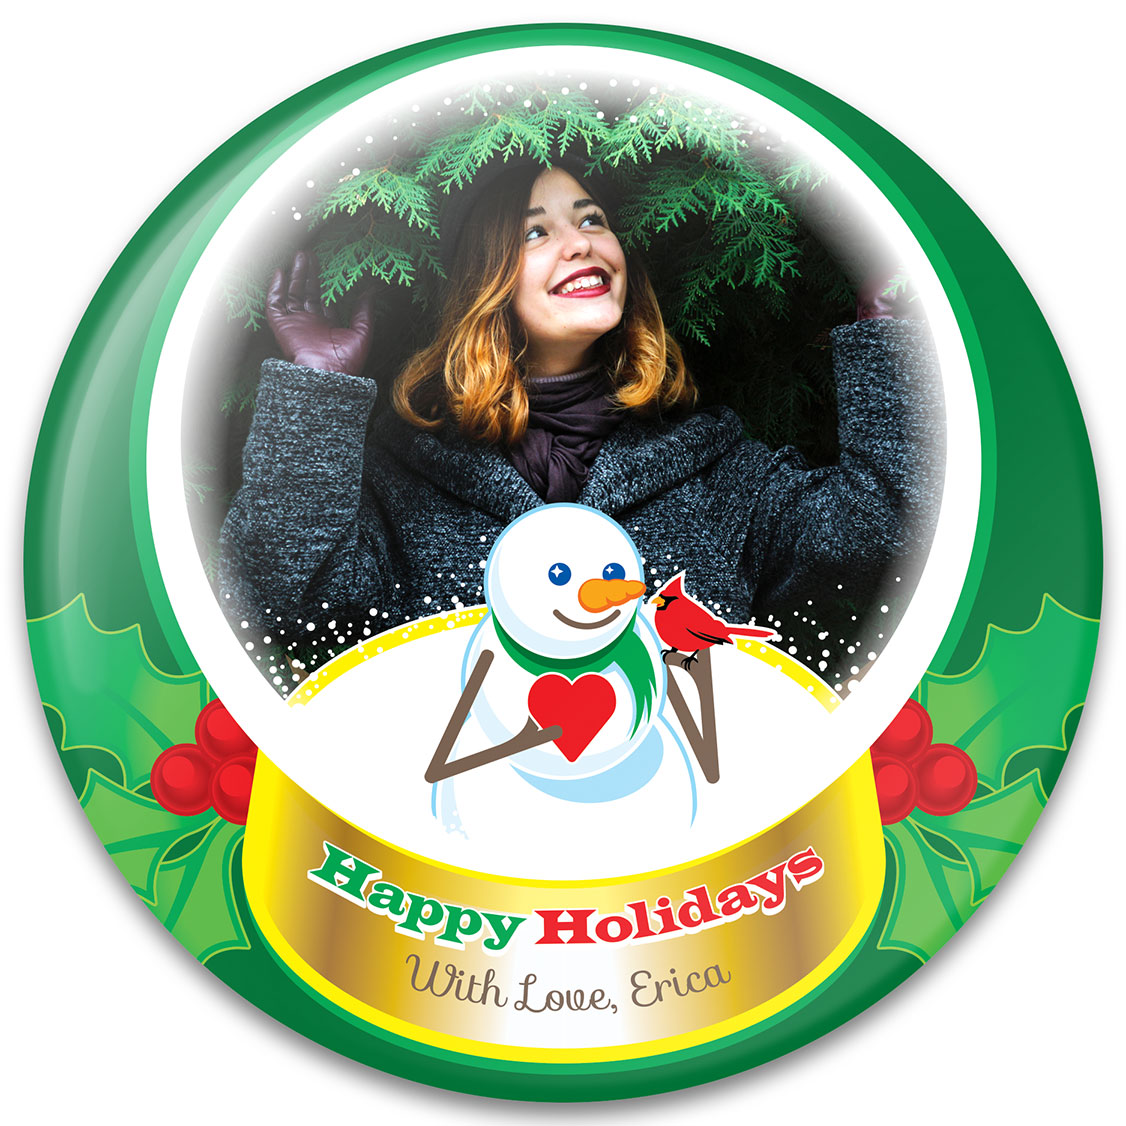 Snowg Lobe Photo Gift Design Christmas Gift Ideas Purebuttons